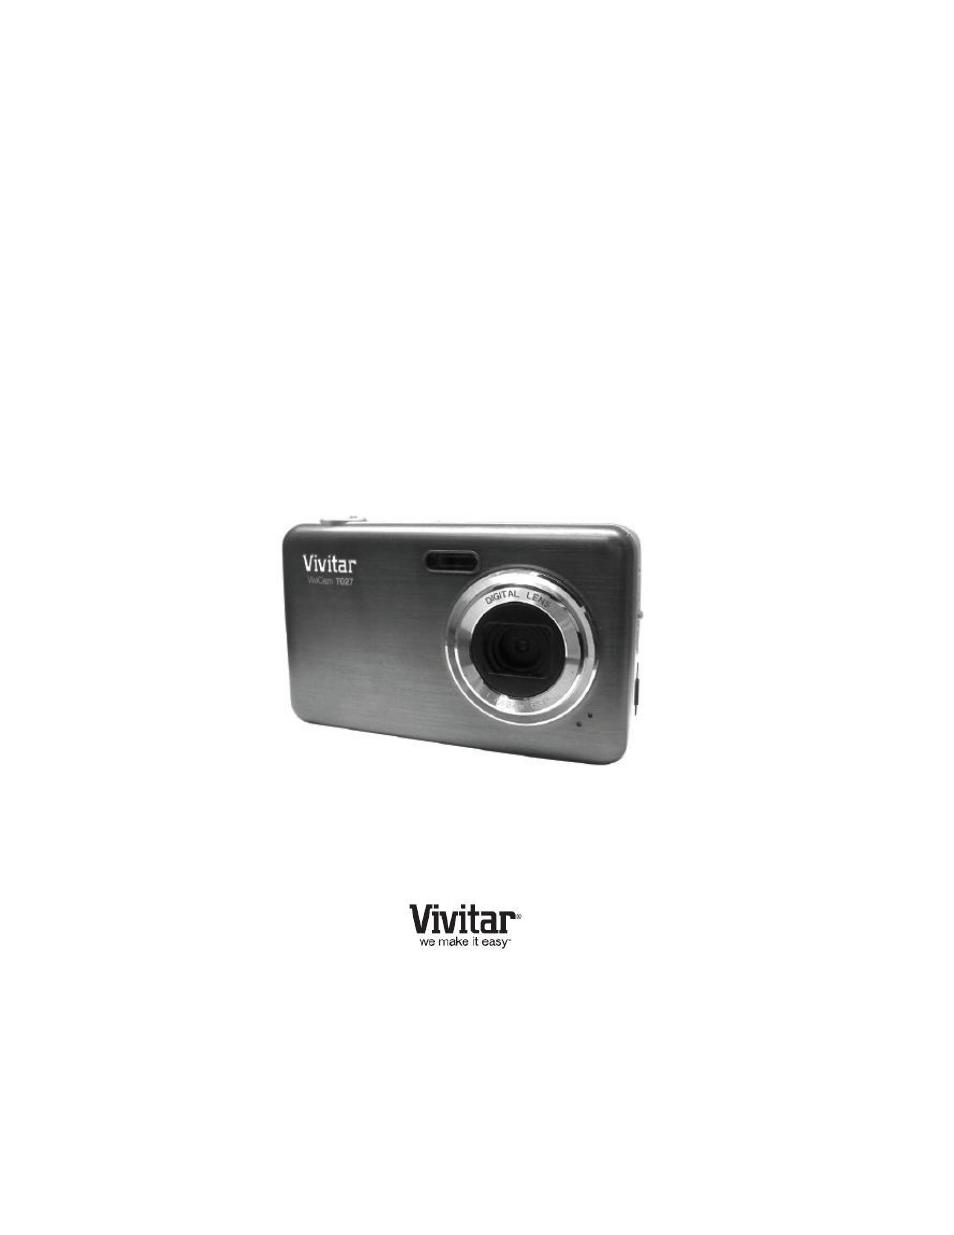 vivitar vivicam t027 user manual 55 pages rh manualsdir com Instruction Manual Book vivitar t027 instruction manual